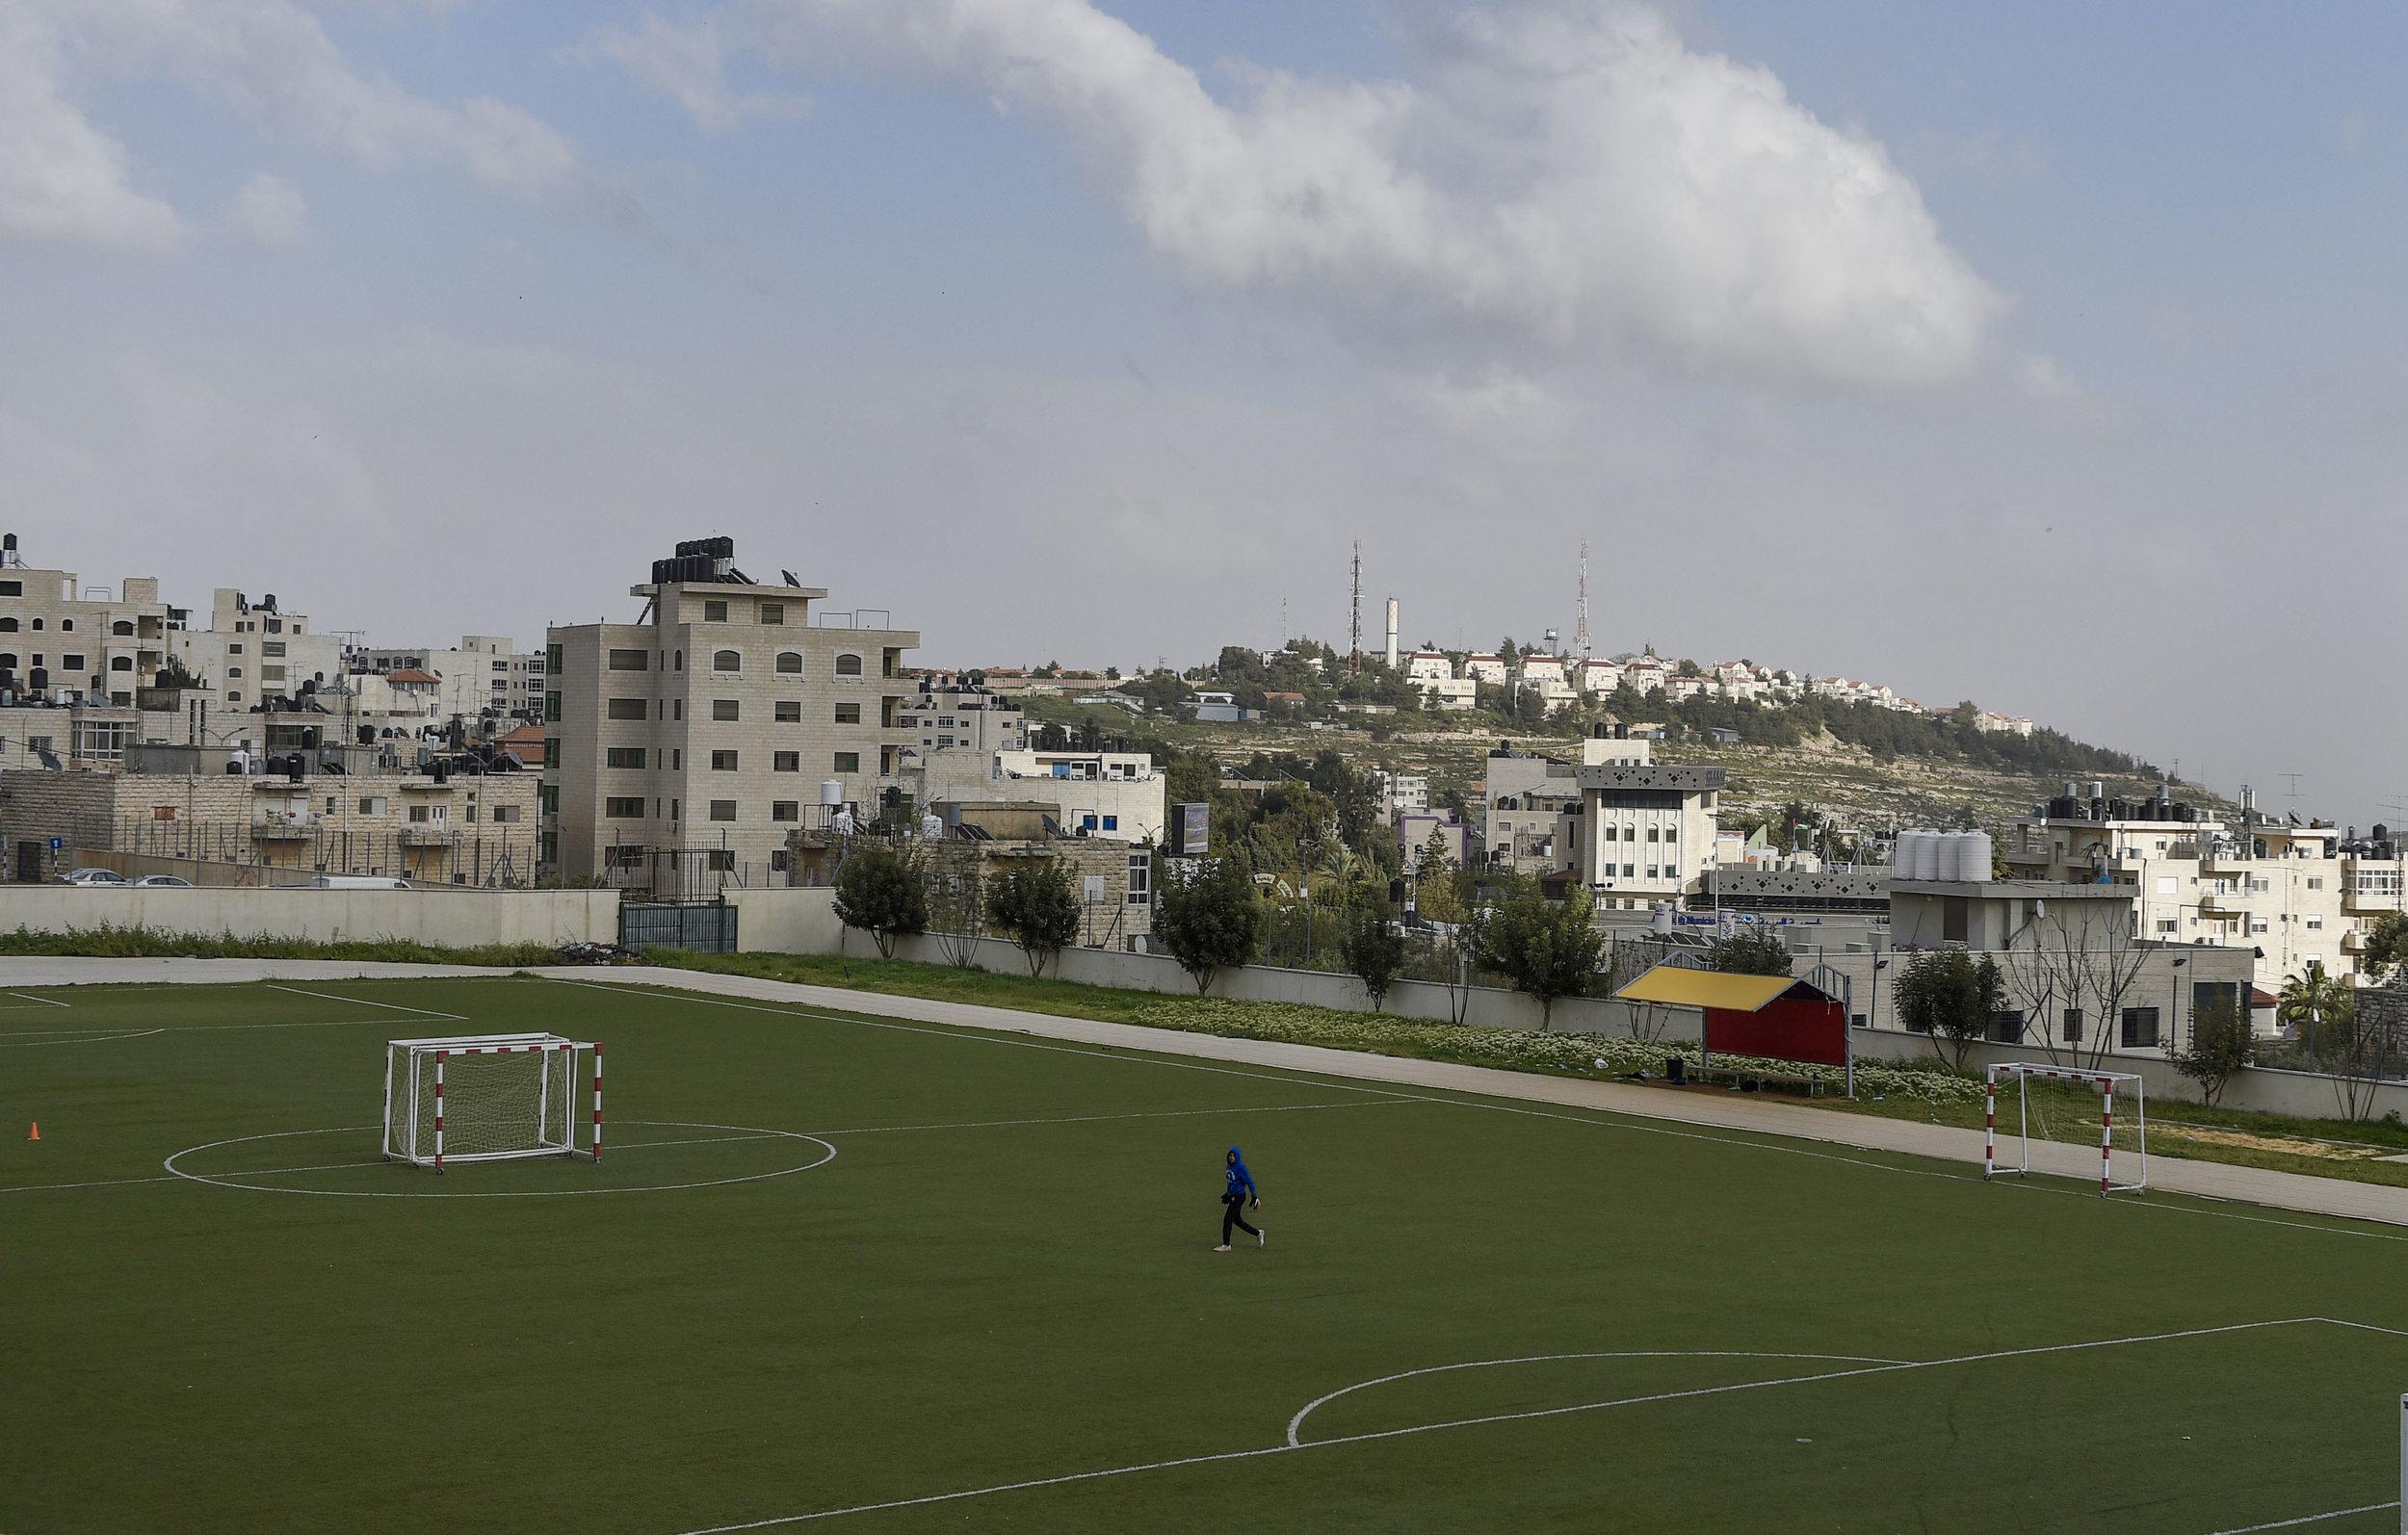 SoccerField01.jpg